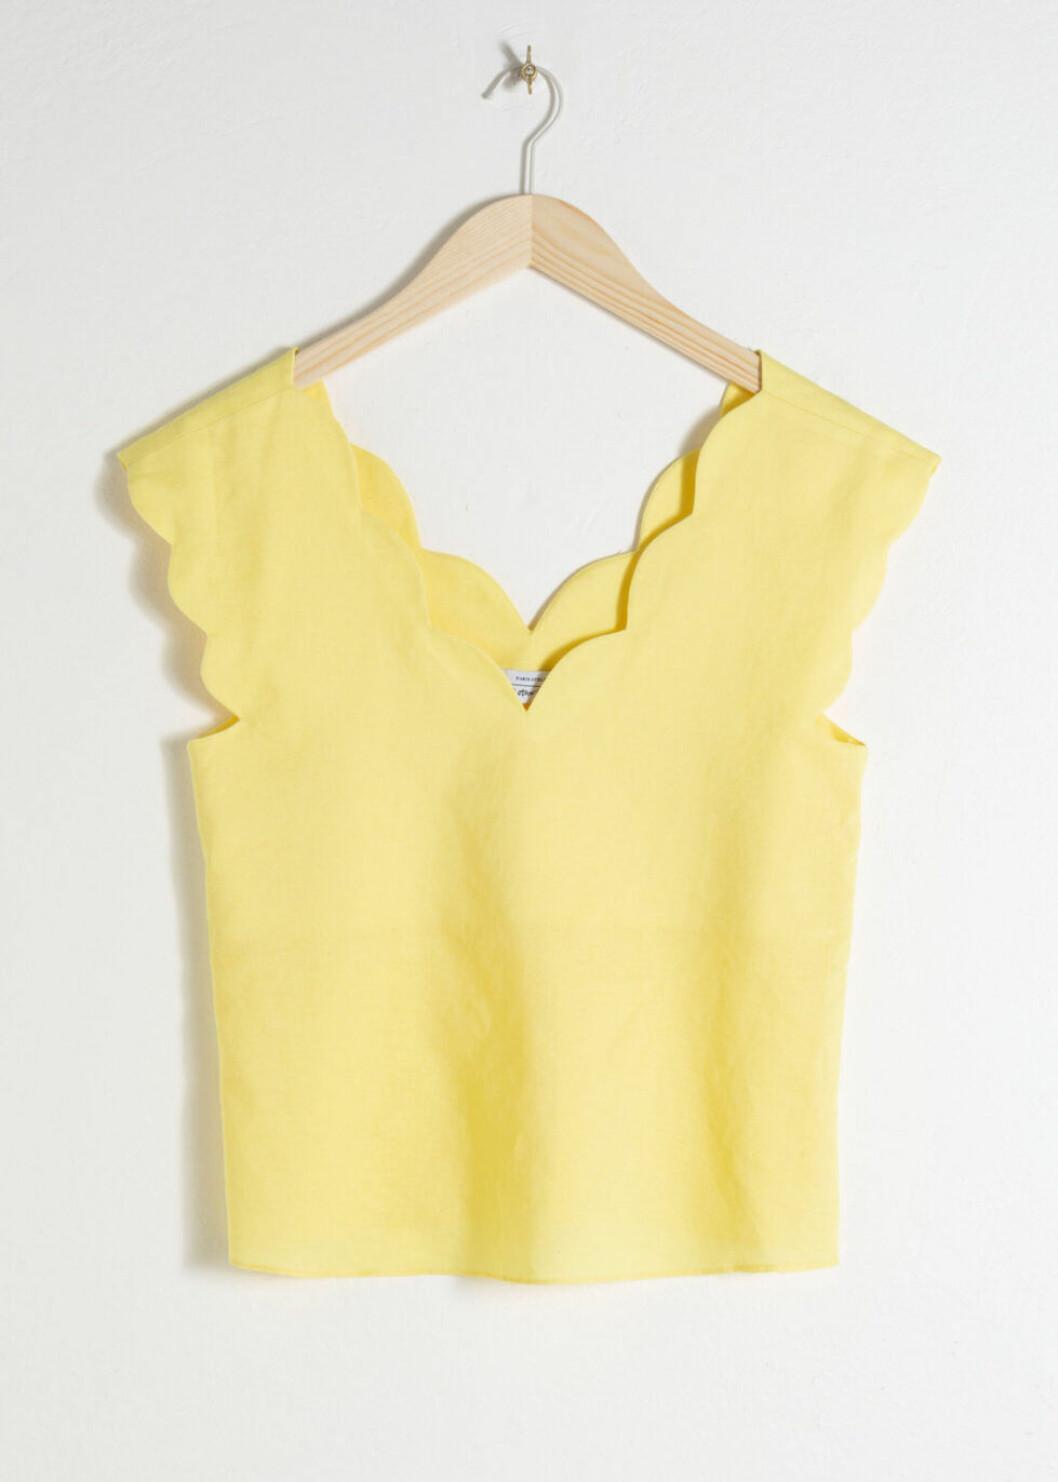 gula kläder 2019